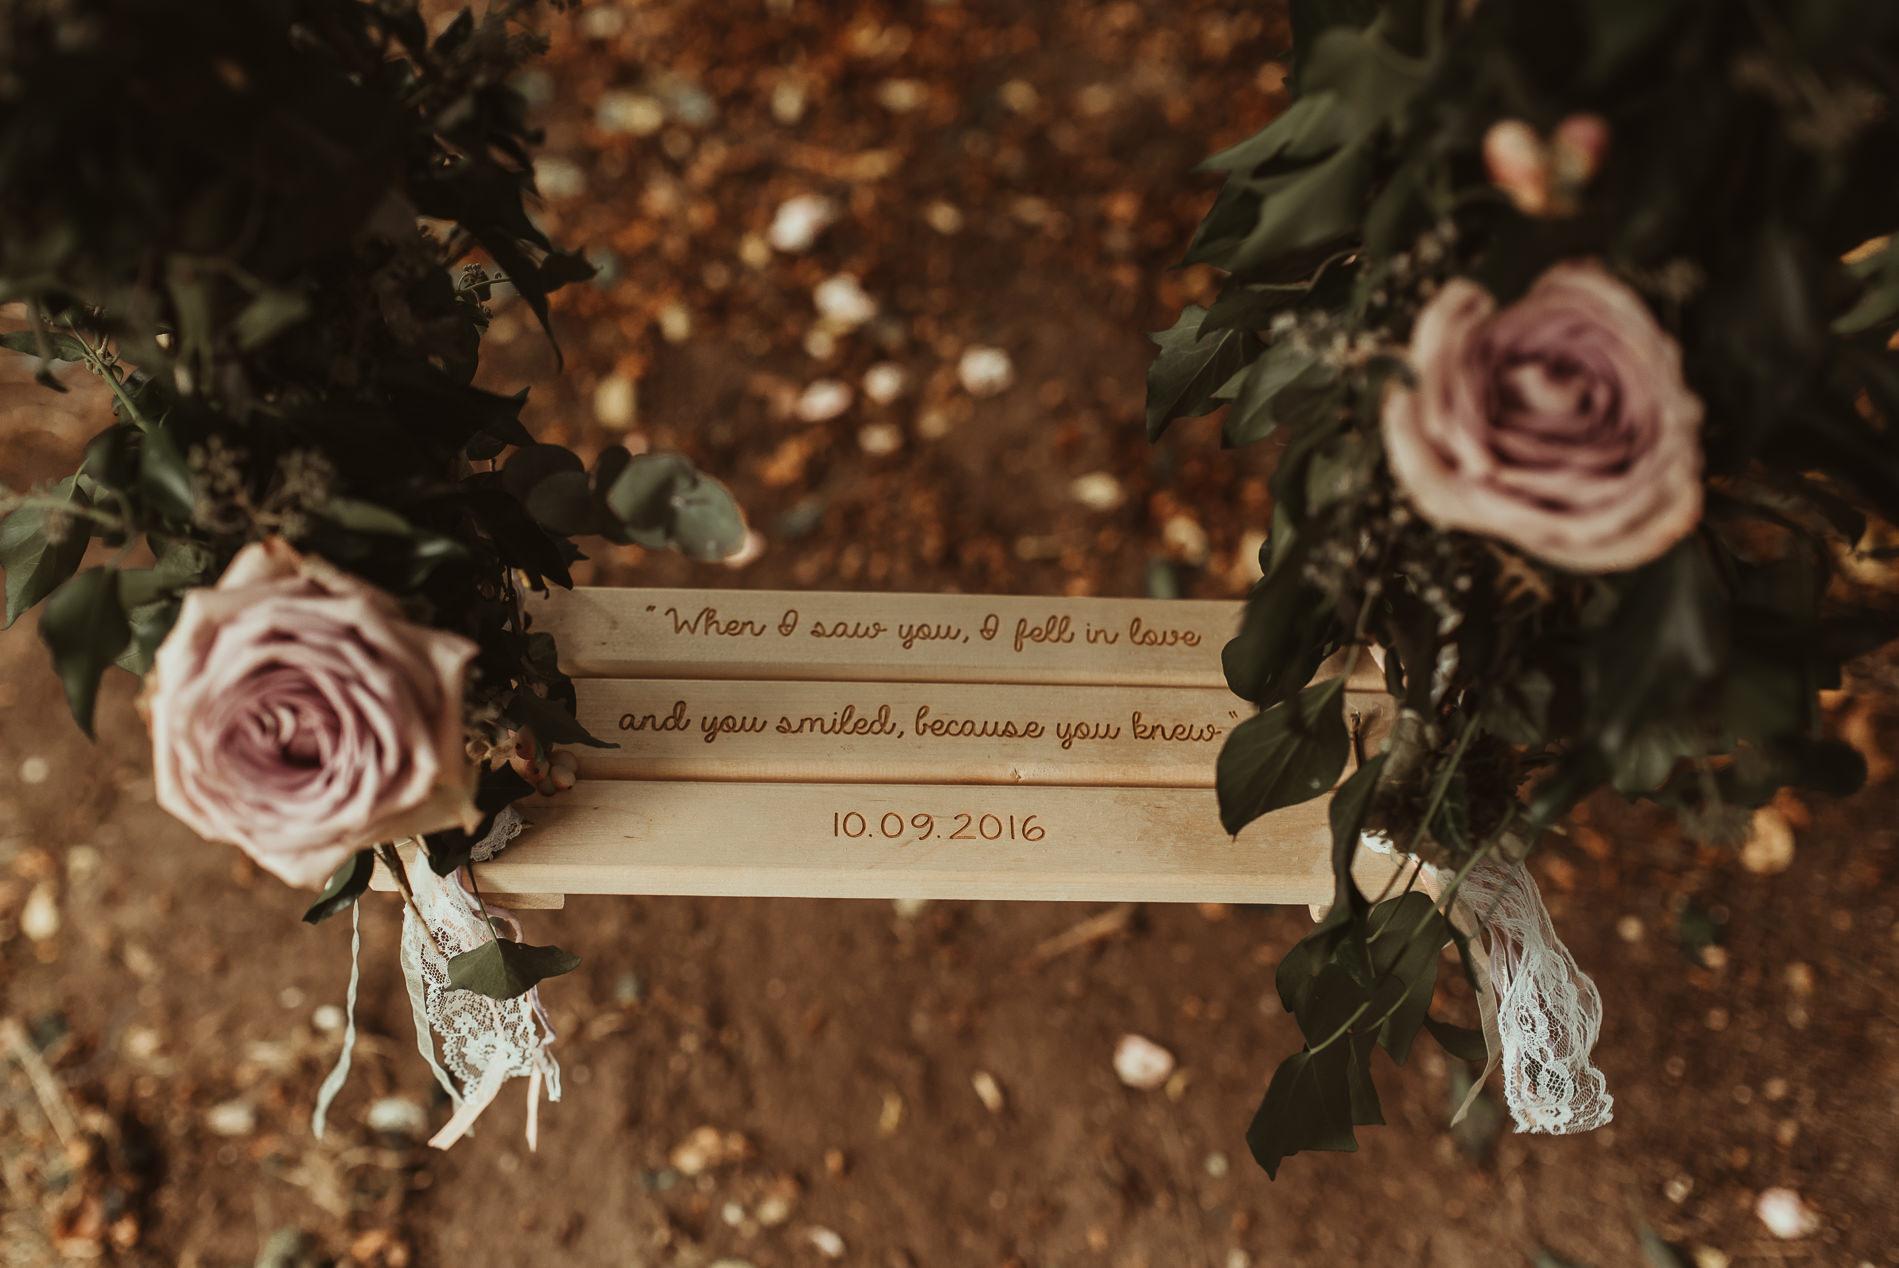 bohemian_wedding_lawshall_church_garden56